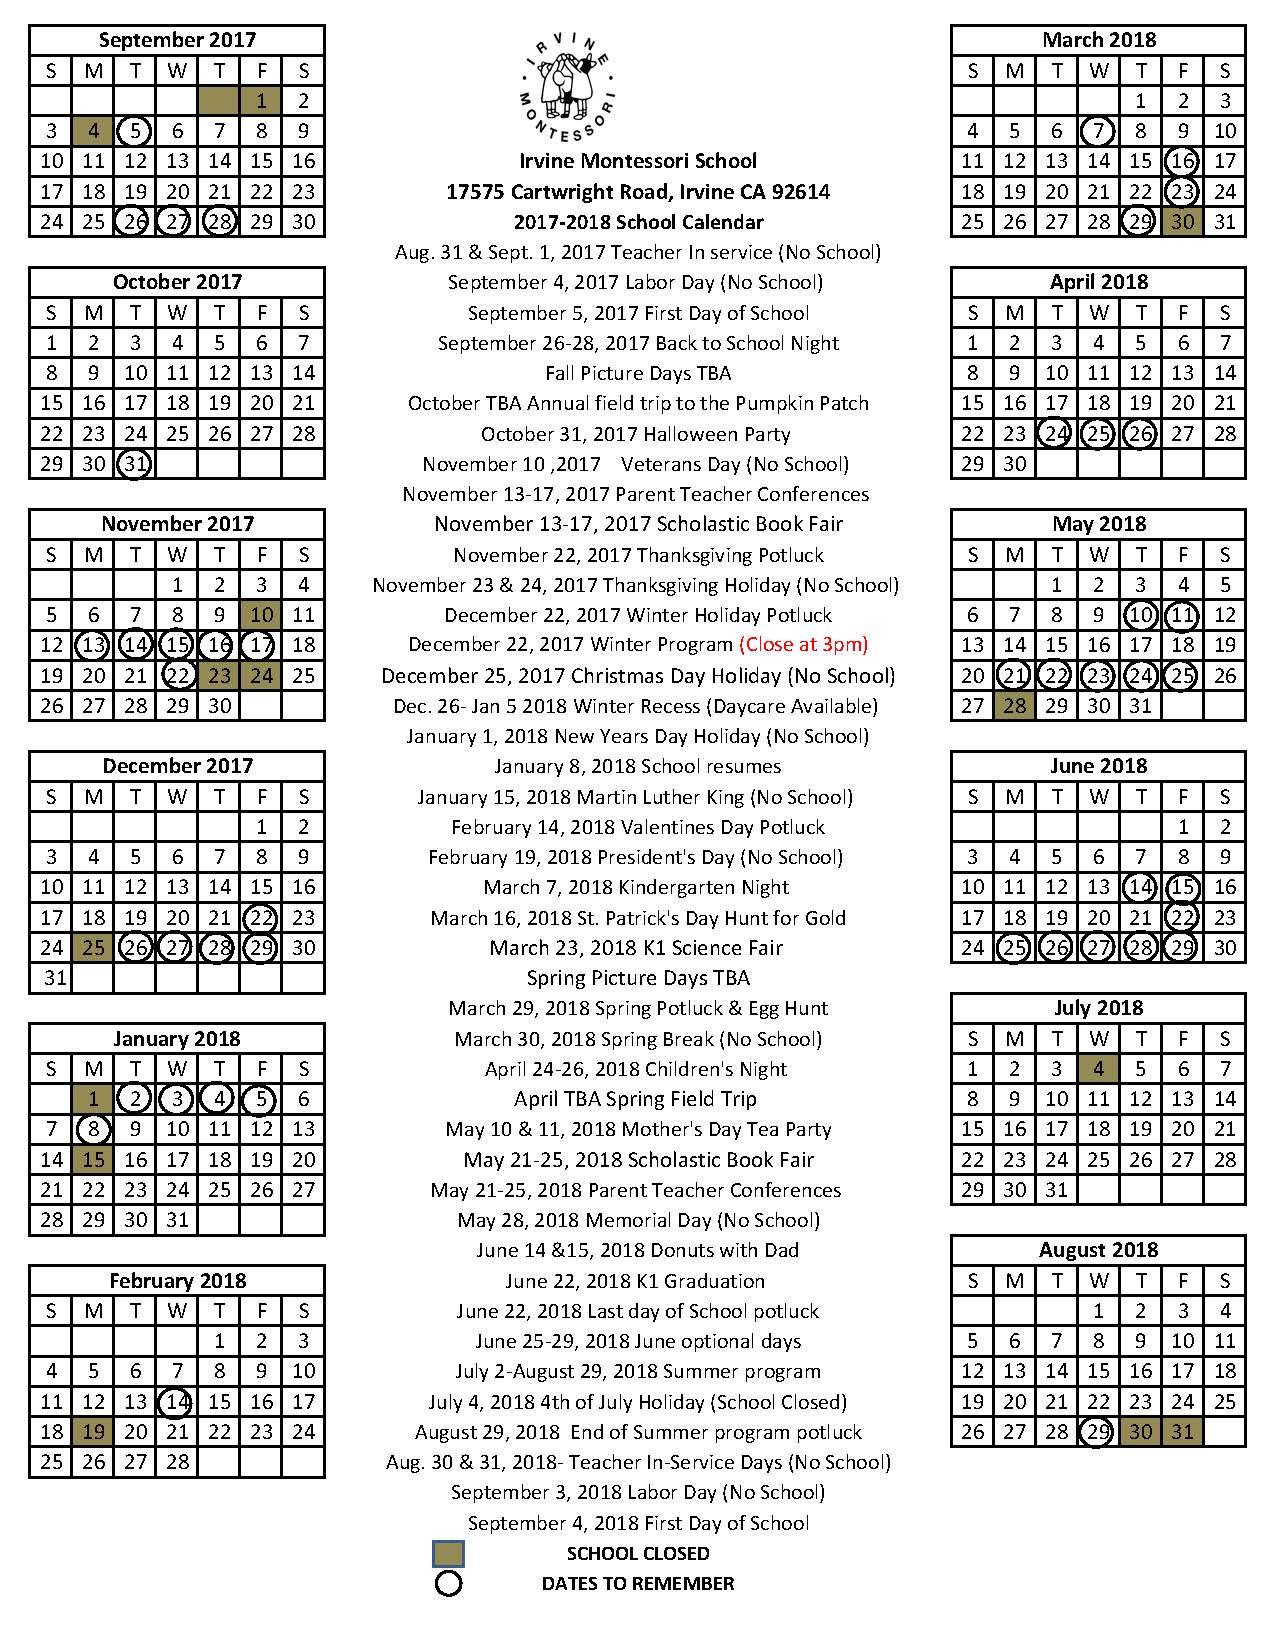 Calendar | Newport Montessori School | pertaining to 2020 And 2020 Pei School Calendar